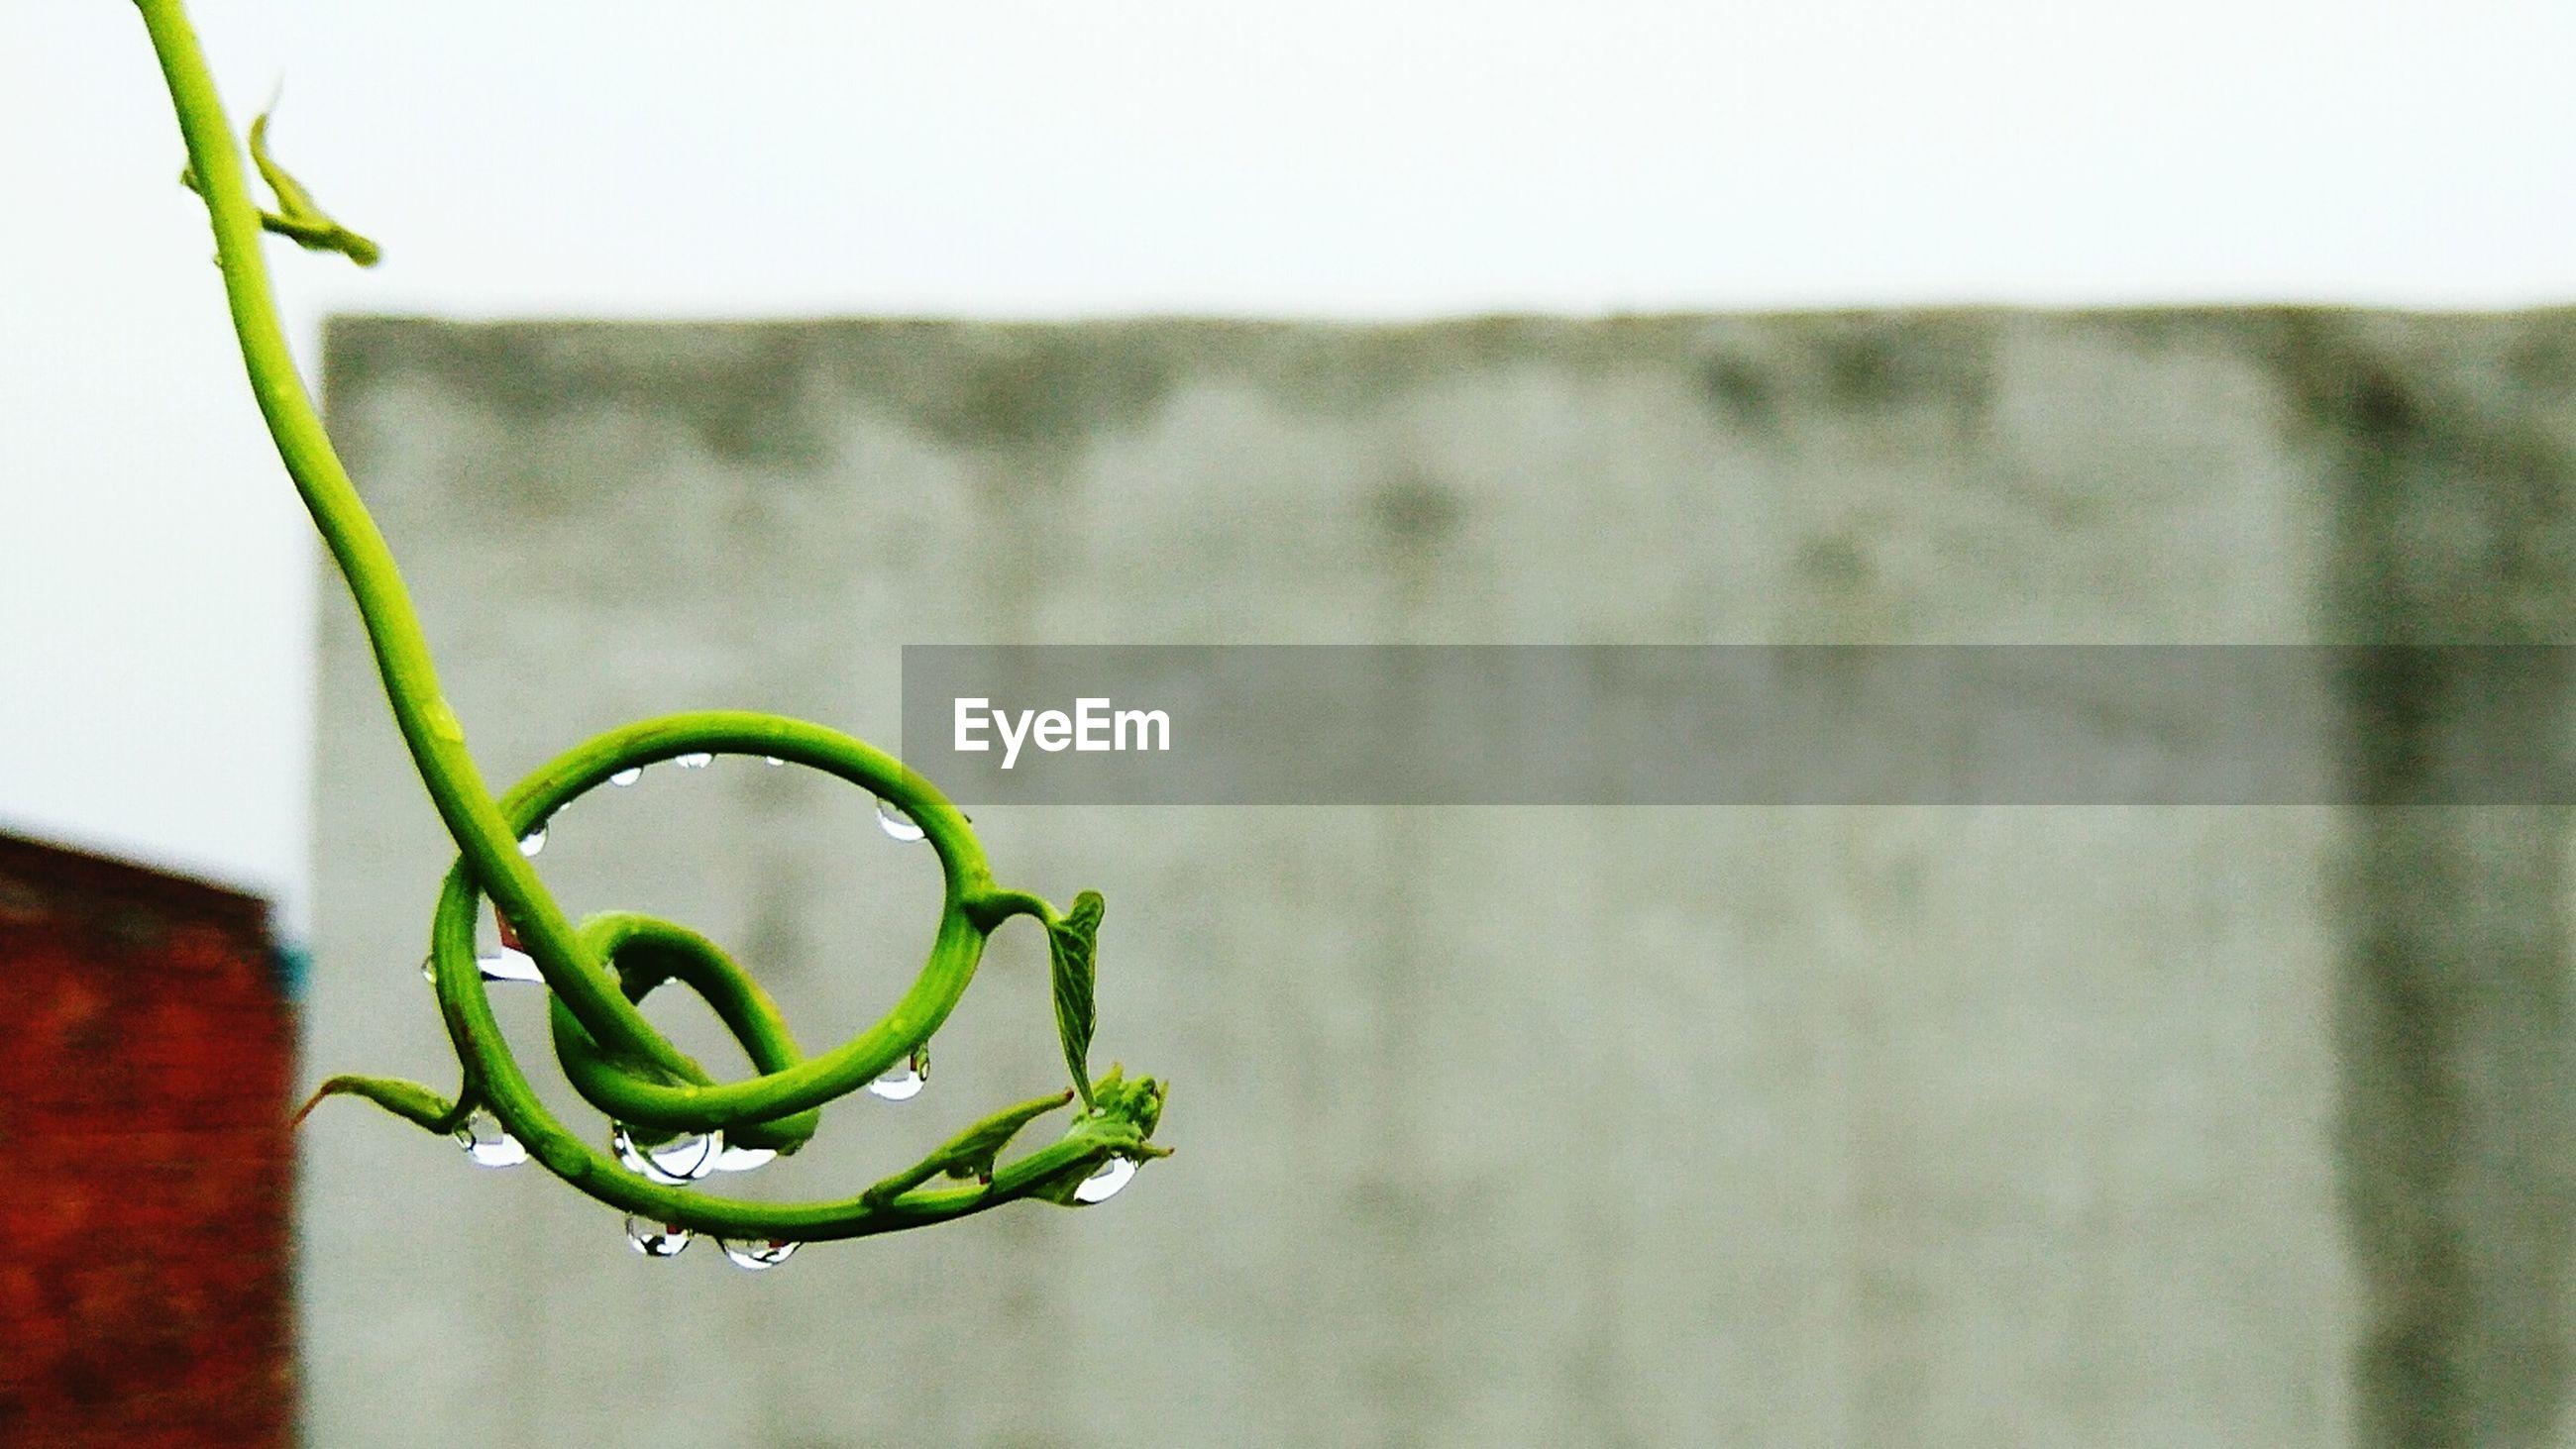 Close-up of raindrops on creeper plant against wall during rainy season